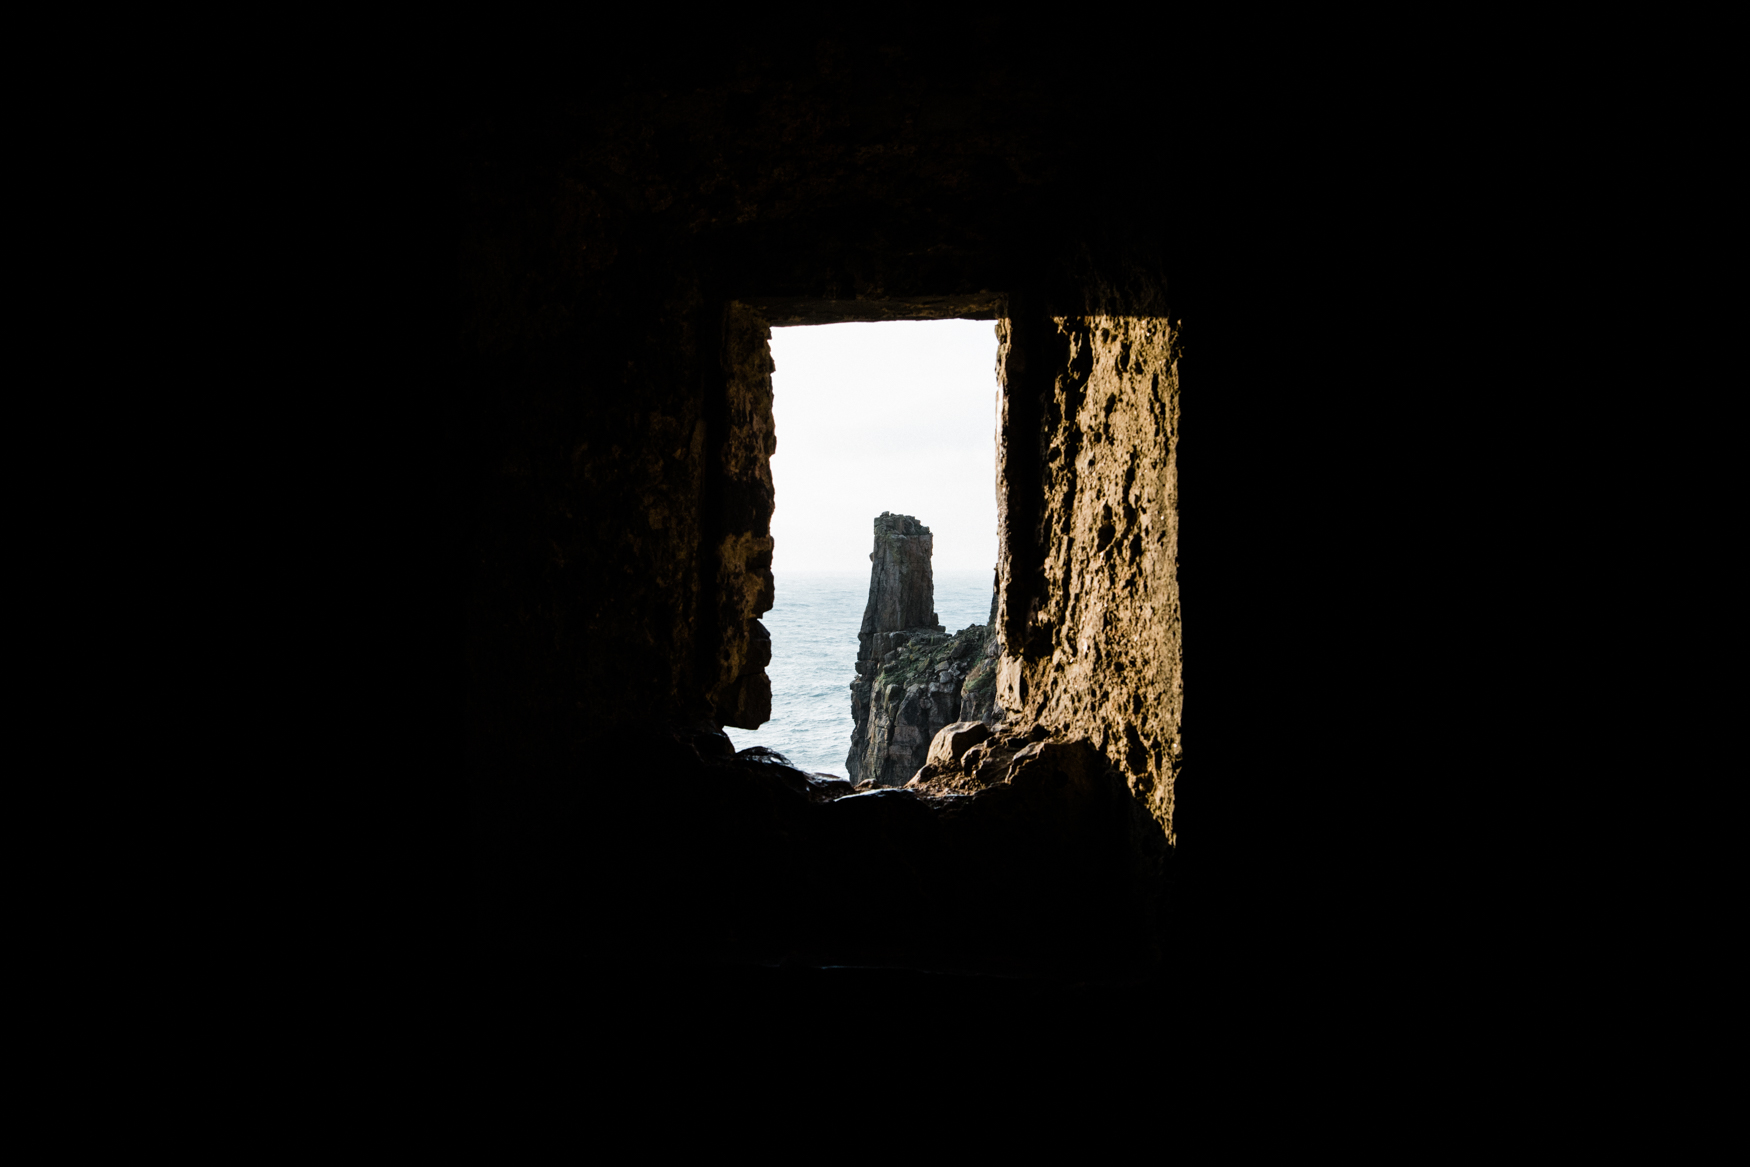 Alex-Sedgmond-Photography-Cardiff-Prewedding-Photography-Castlemartin-Pembrokeshire-WestWales-2.JPG